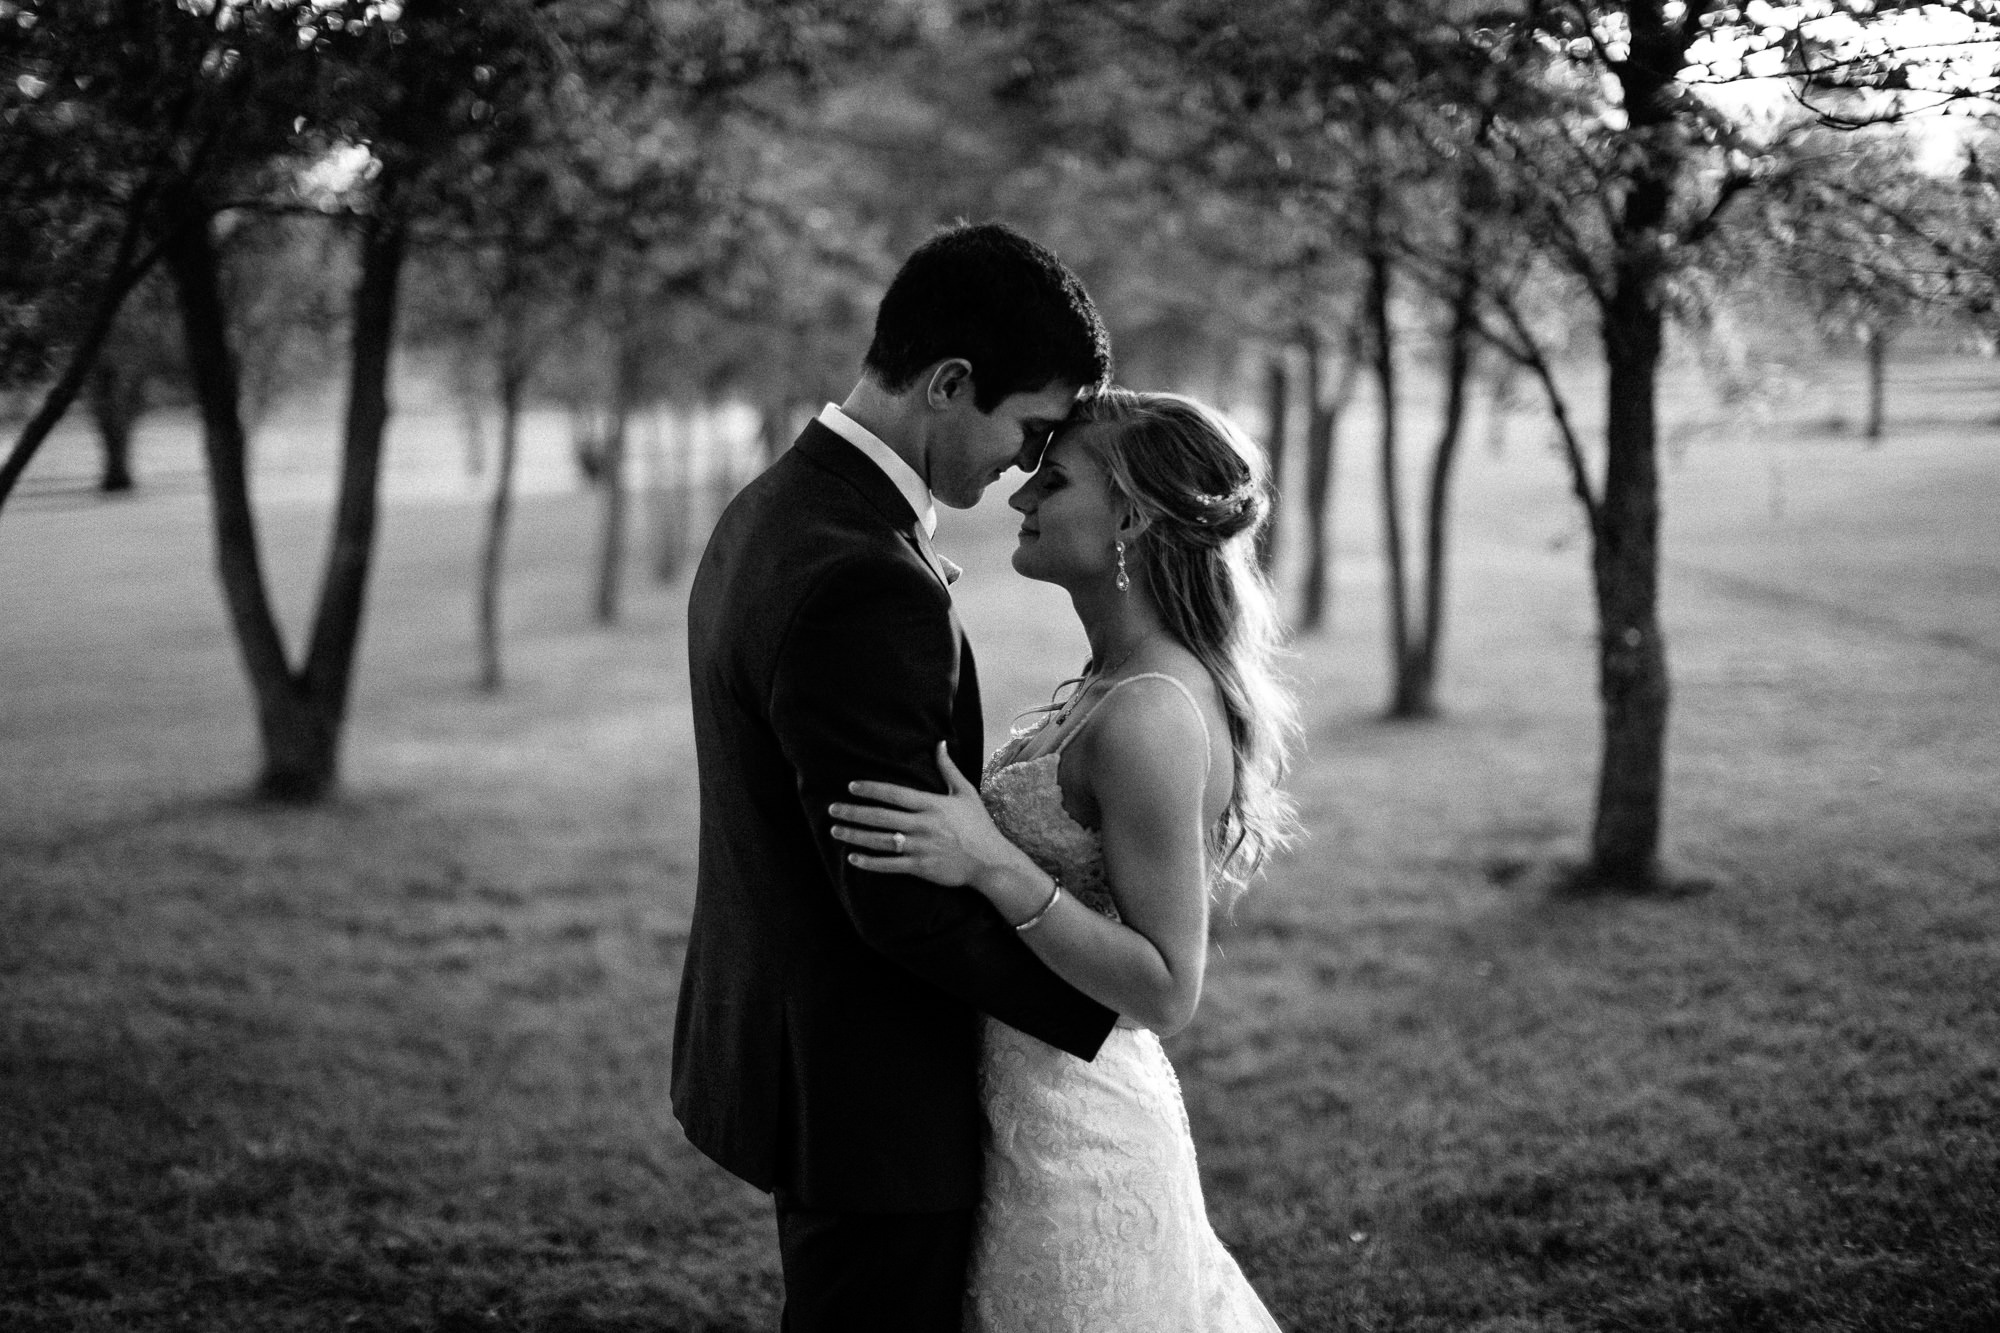 wedding-elopement-adventerous-romantic-timeless-south-dakota-blue-haven-barn-078.jpg